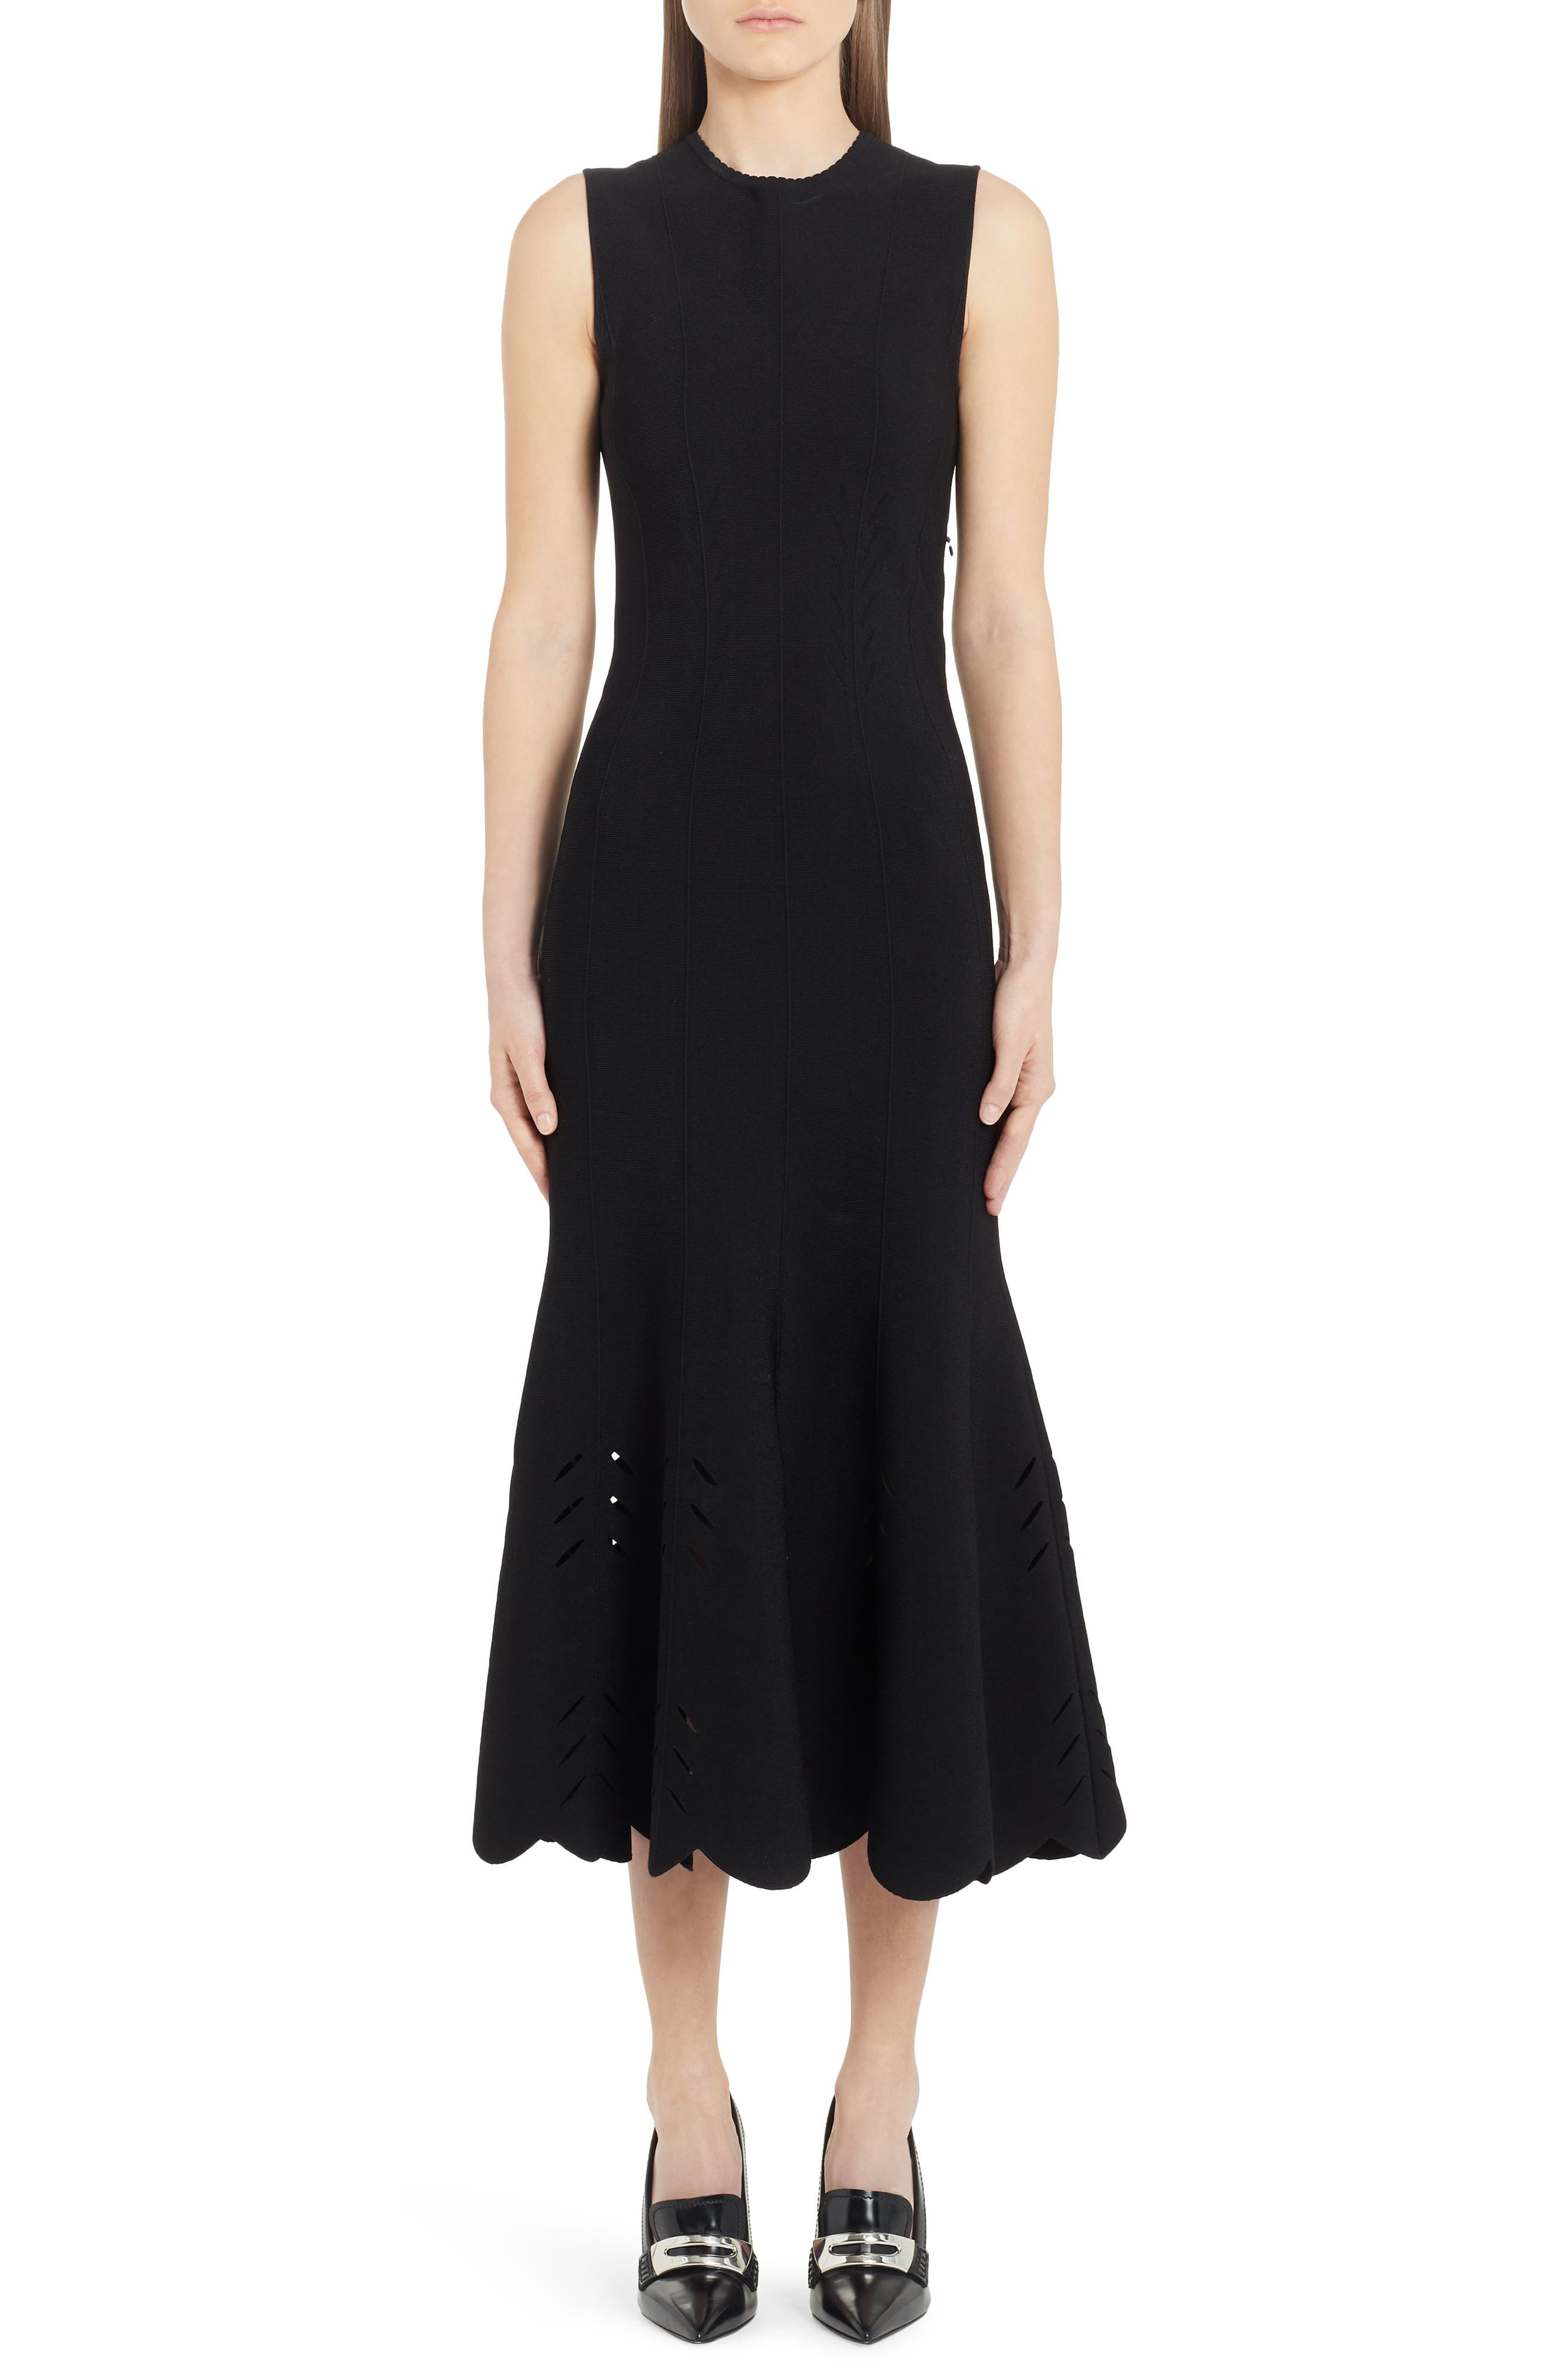 Alexander Mcqueen Cutout Scallop Hem Midi Sweater Dress, Black